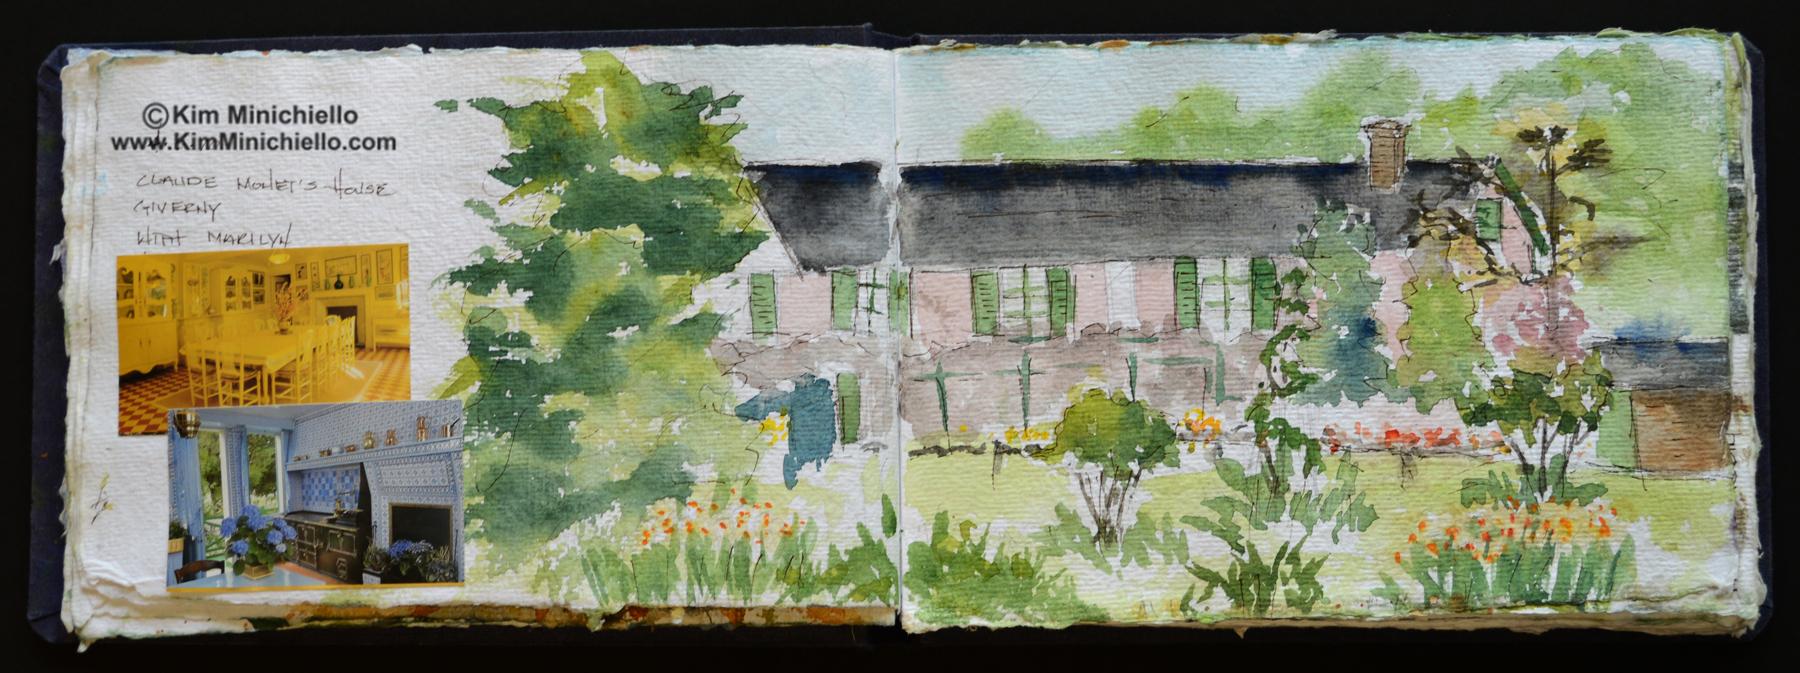 Watercolor Sketch on Handmade Paper